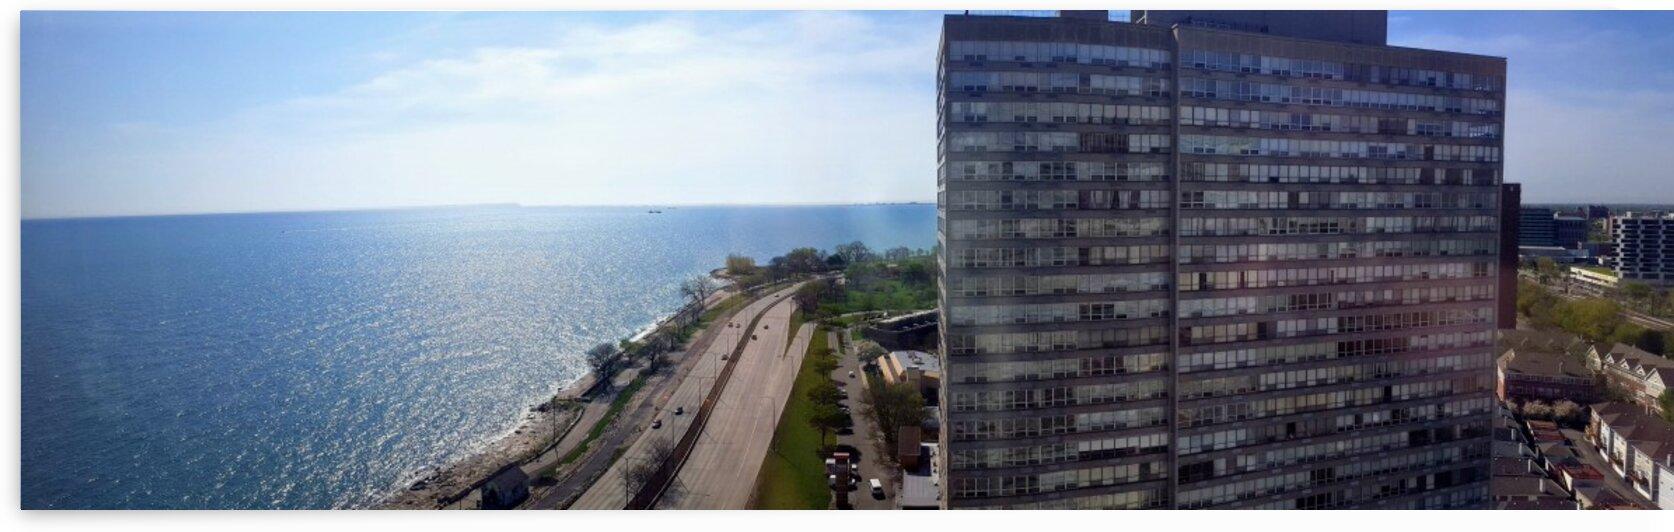 Chicago by Sara Mikhail